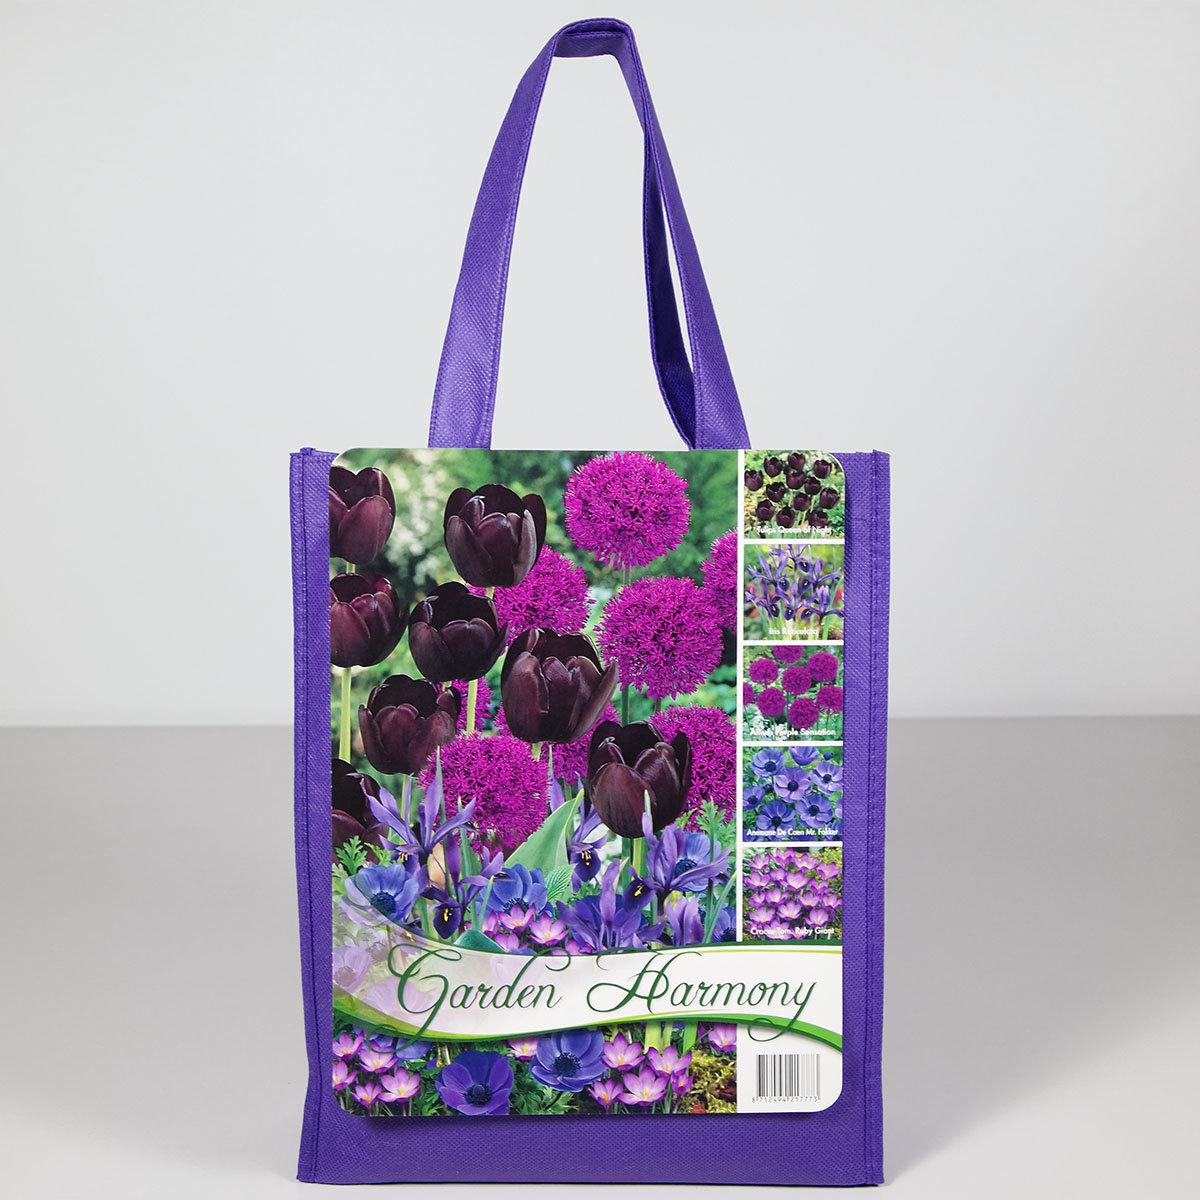 Blumenzwiebel-Sortiment Blauer Frühlings-Garten